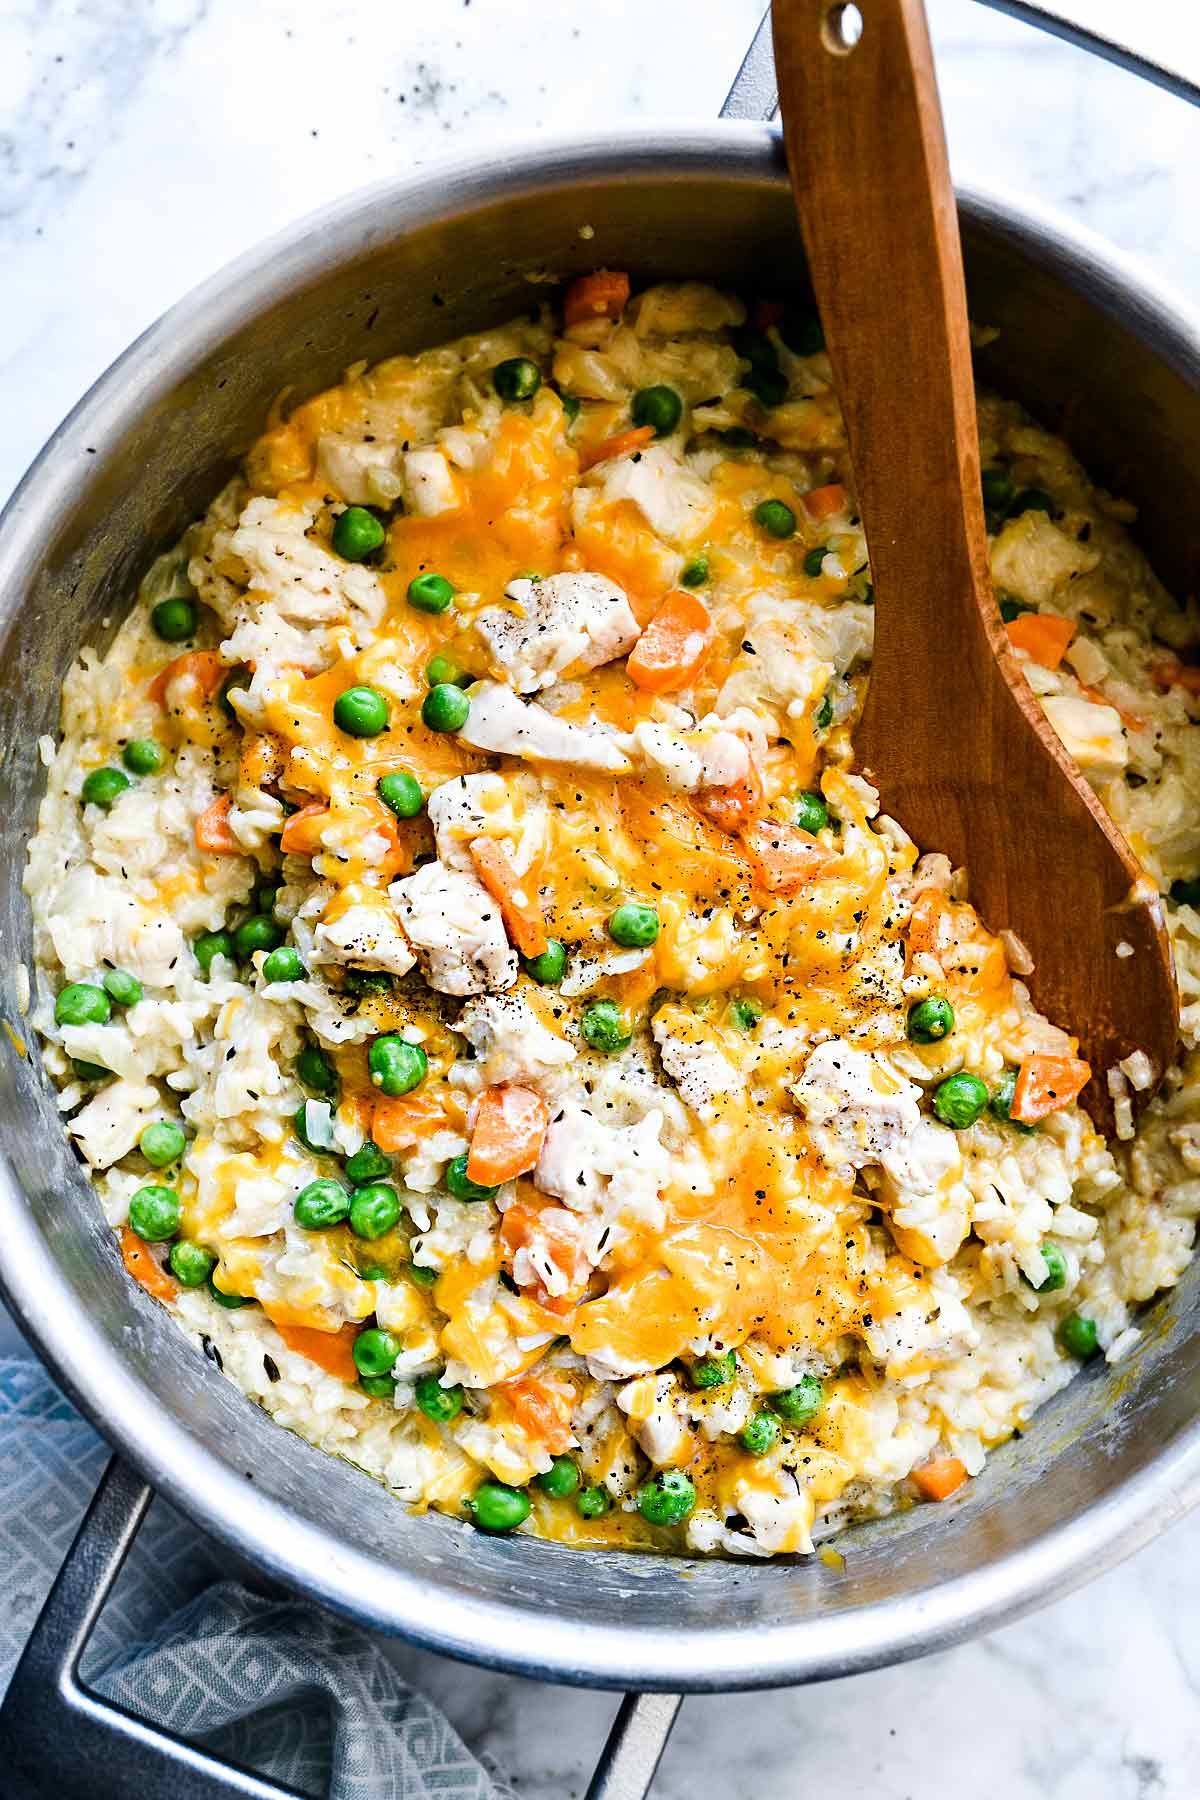 Creamy Chicken And Rice Casserole One Pot Recipe Foodiecrush Com